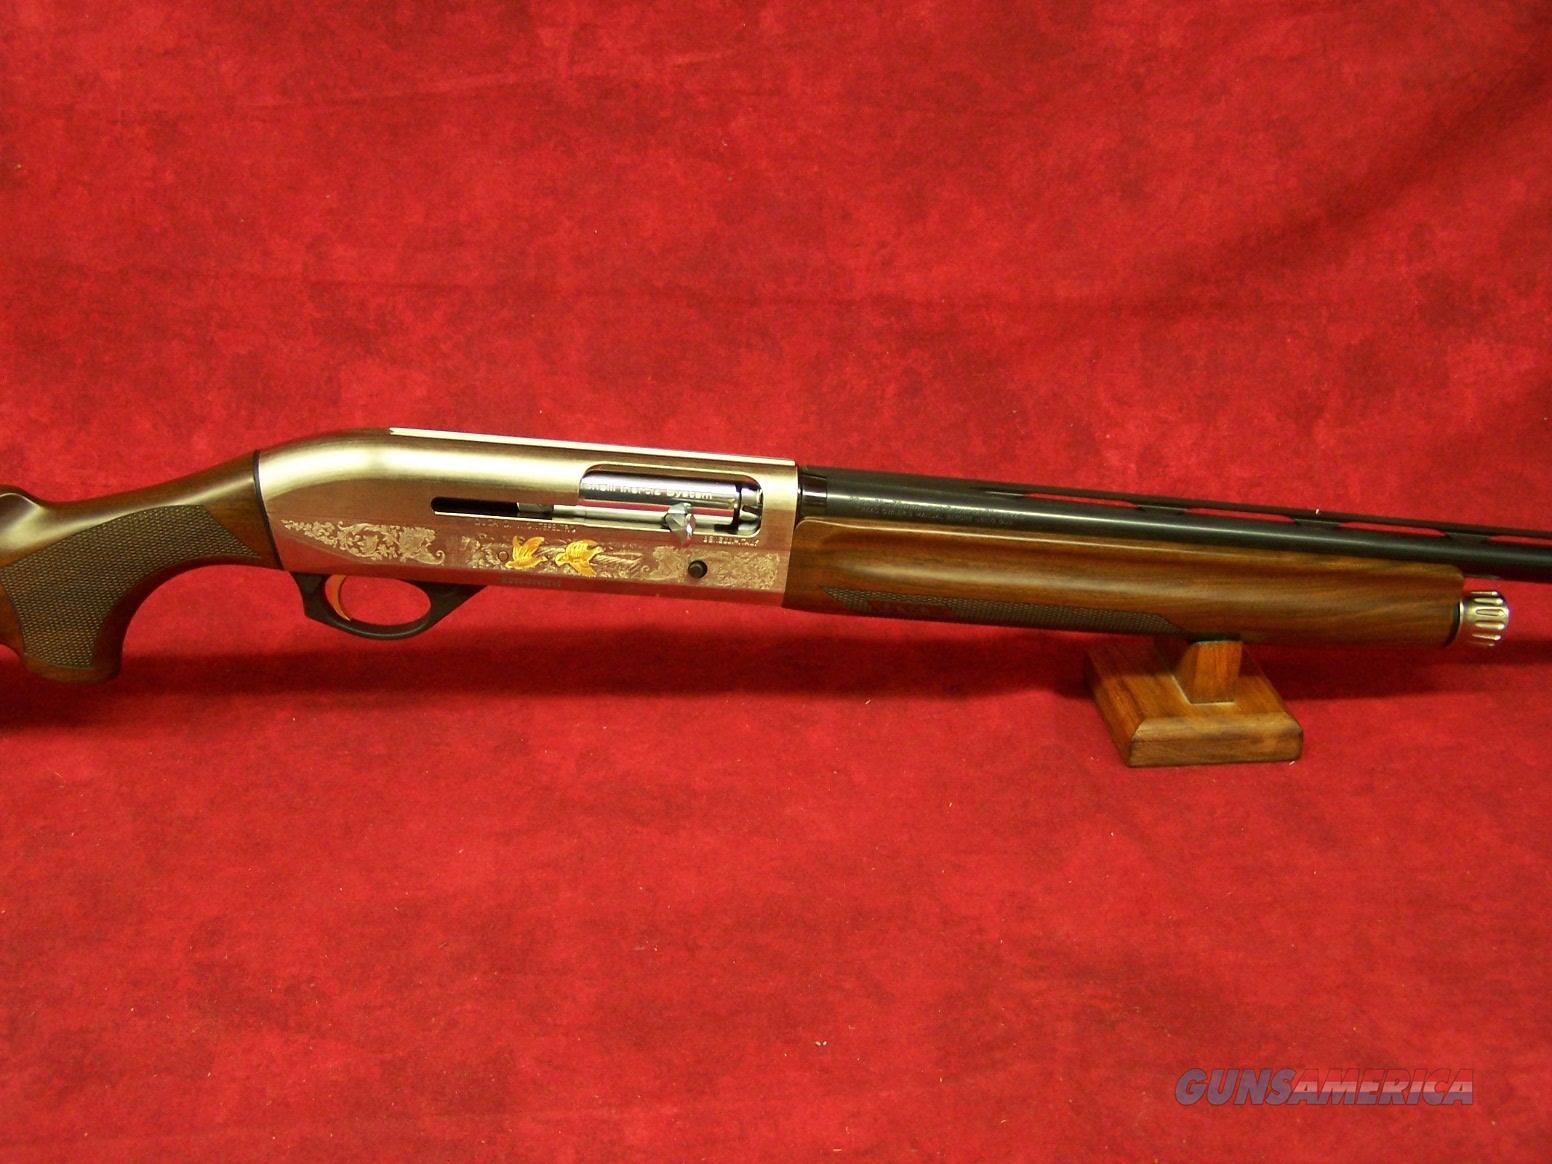 "Benelli Montefeltro Silver 20 Ga 3"" AA Grade Satin Walnut Nickel/Blue Etched Game Scene 26"" Barrel (10855)  Guns > Shotguns > Benelli Shotguns > Sporting"